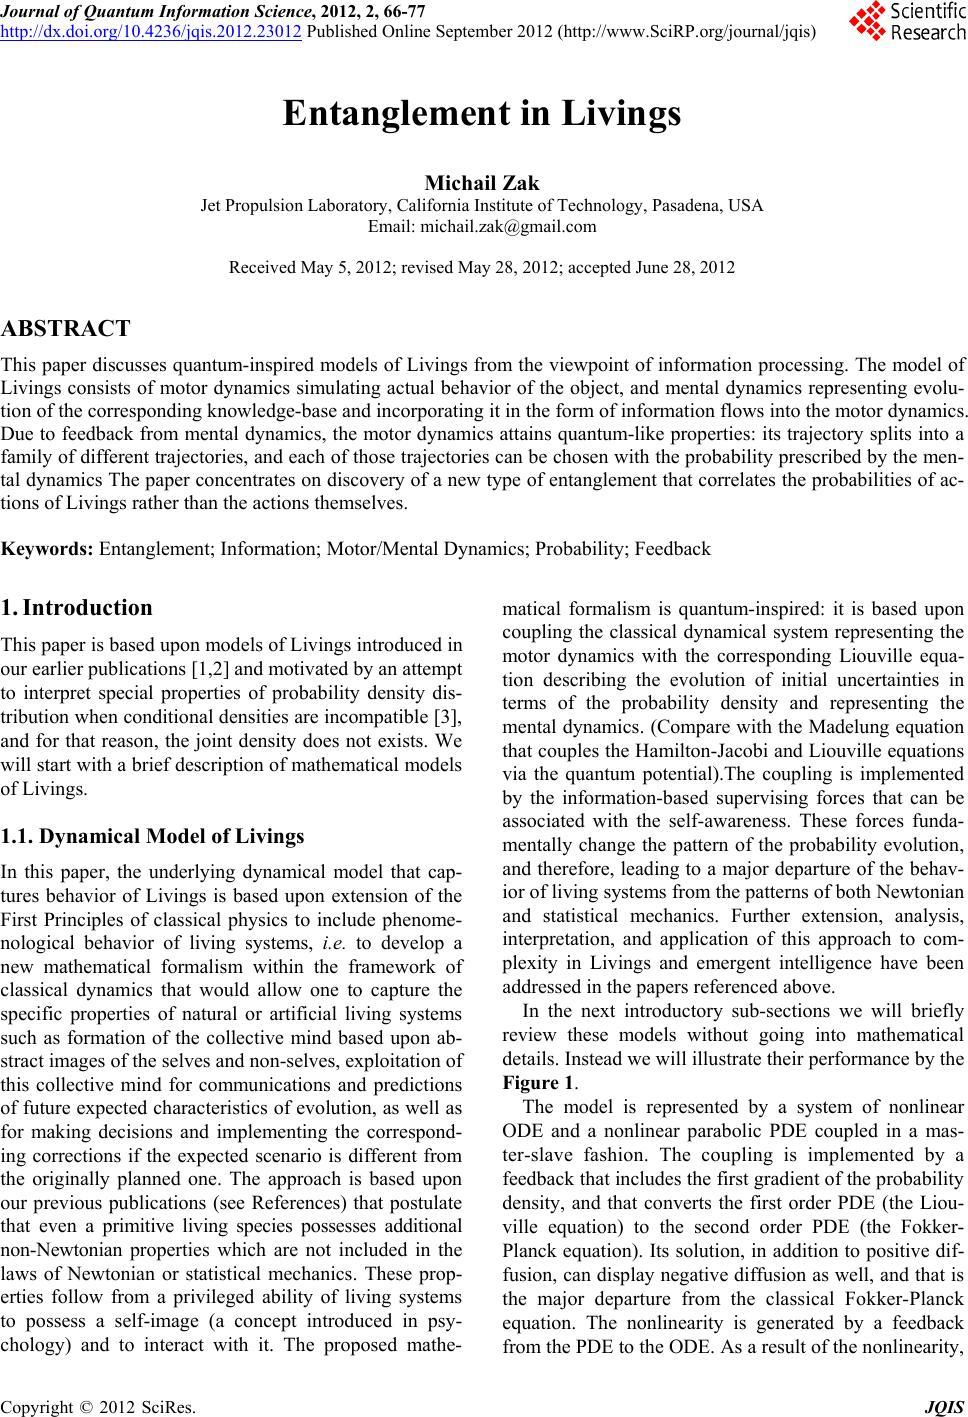 book pediatric uroradiology medical radiology diagnostic